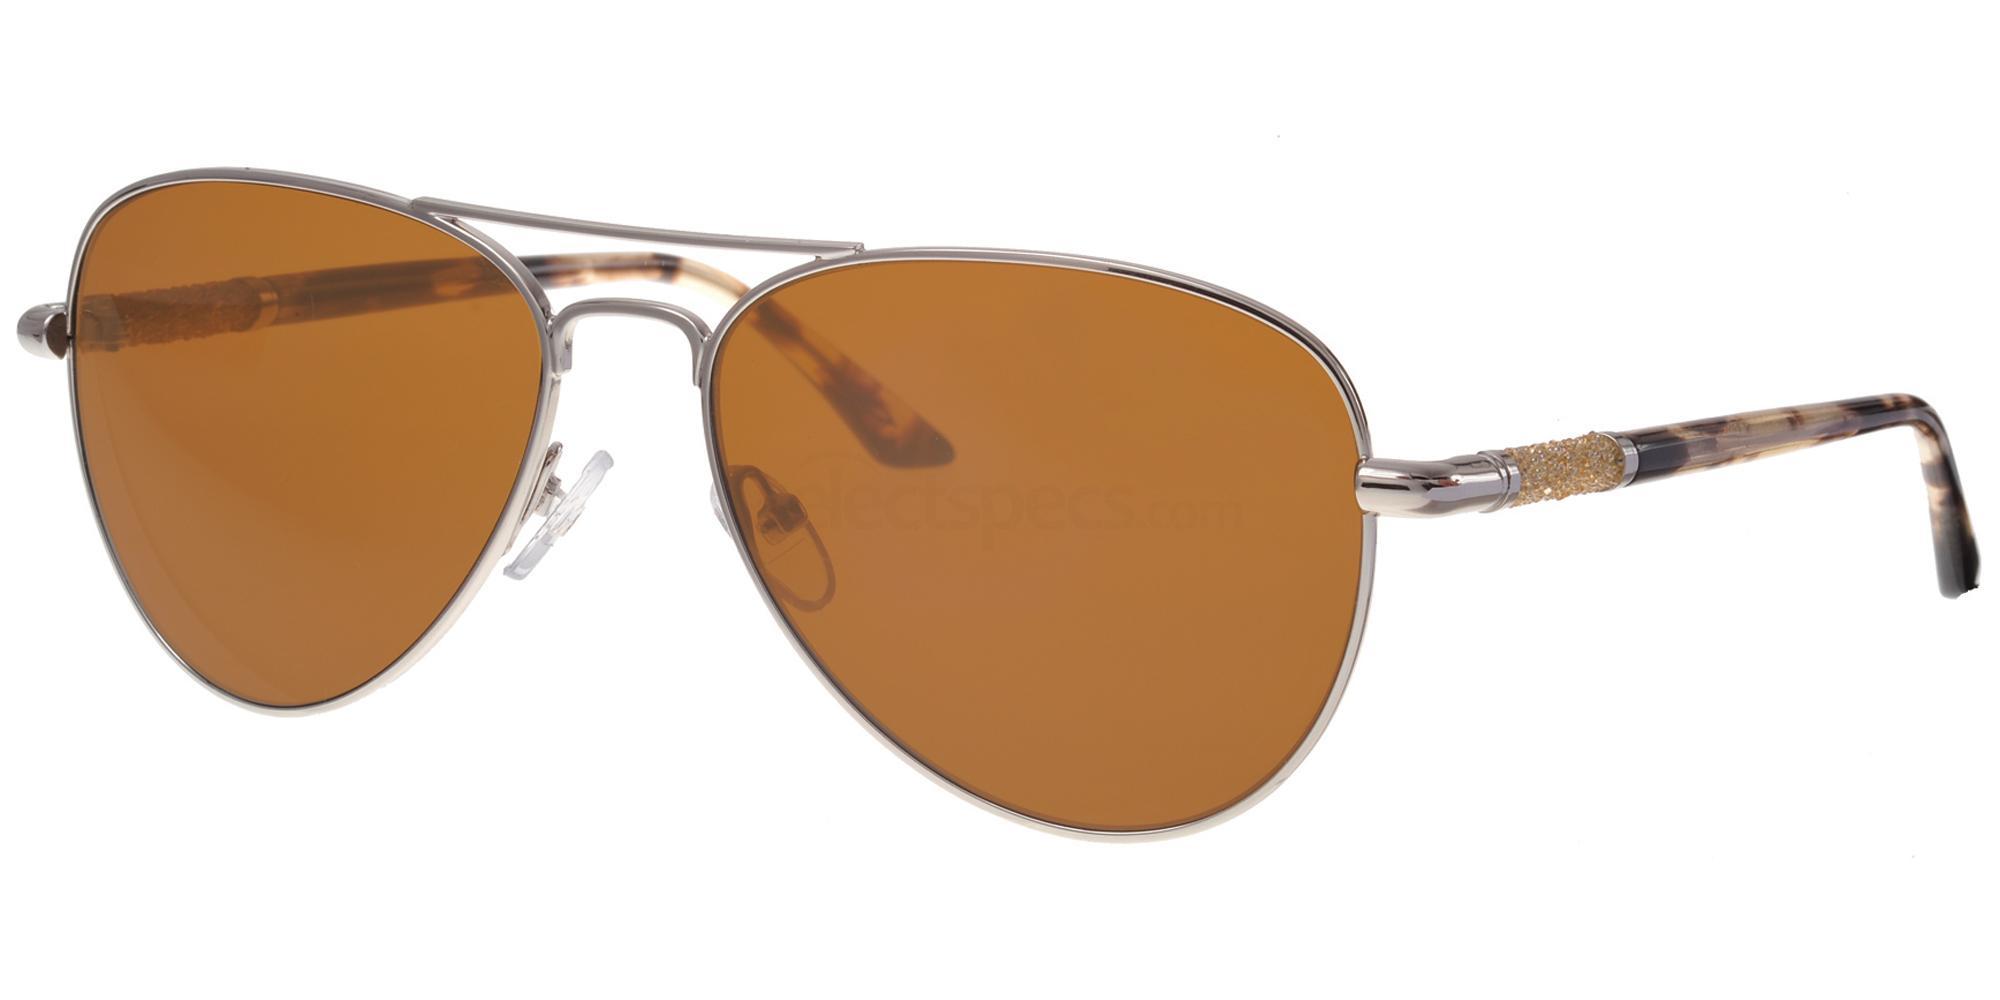 C01 3011 Sunglasses, Joia